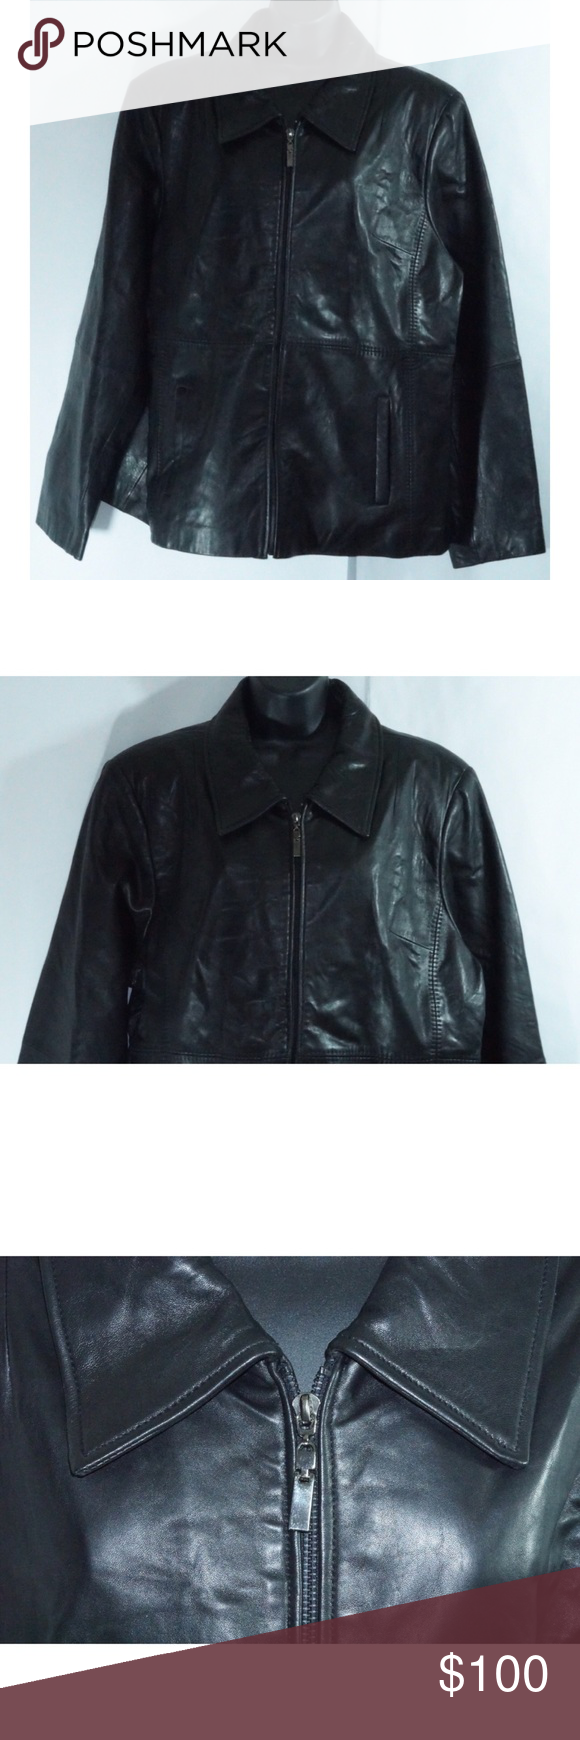 Jones New York Women S Black Leather Jacket 1x Leather Jacket Womens Black Leather Jacket Black Leather Jacket [ 1740 x 580 Pixel ]